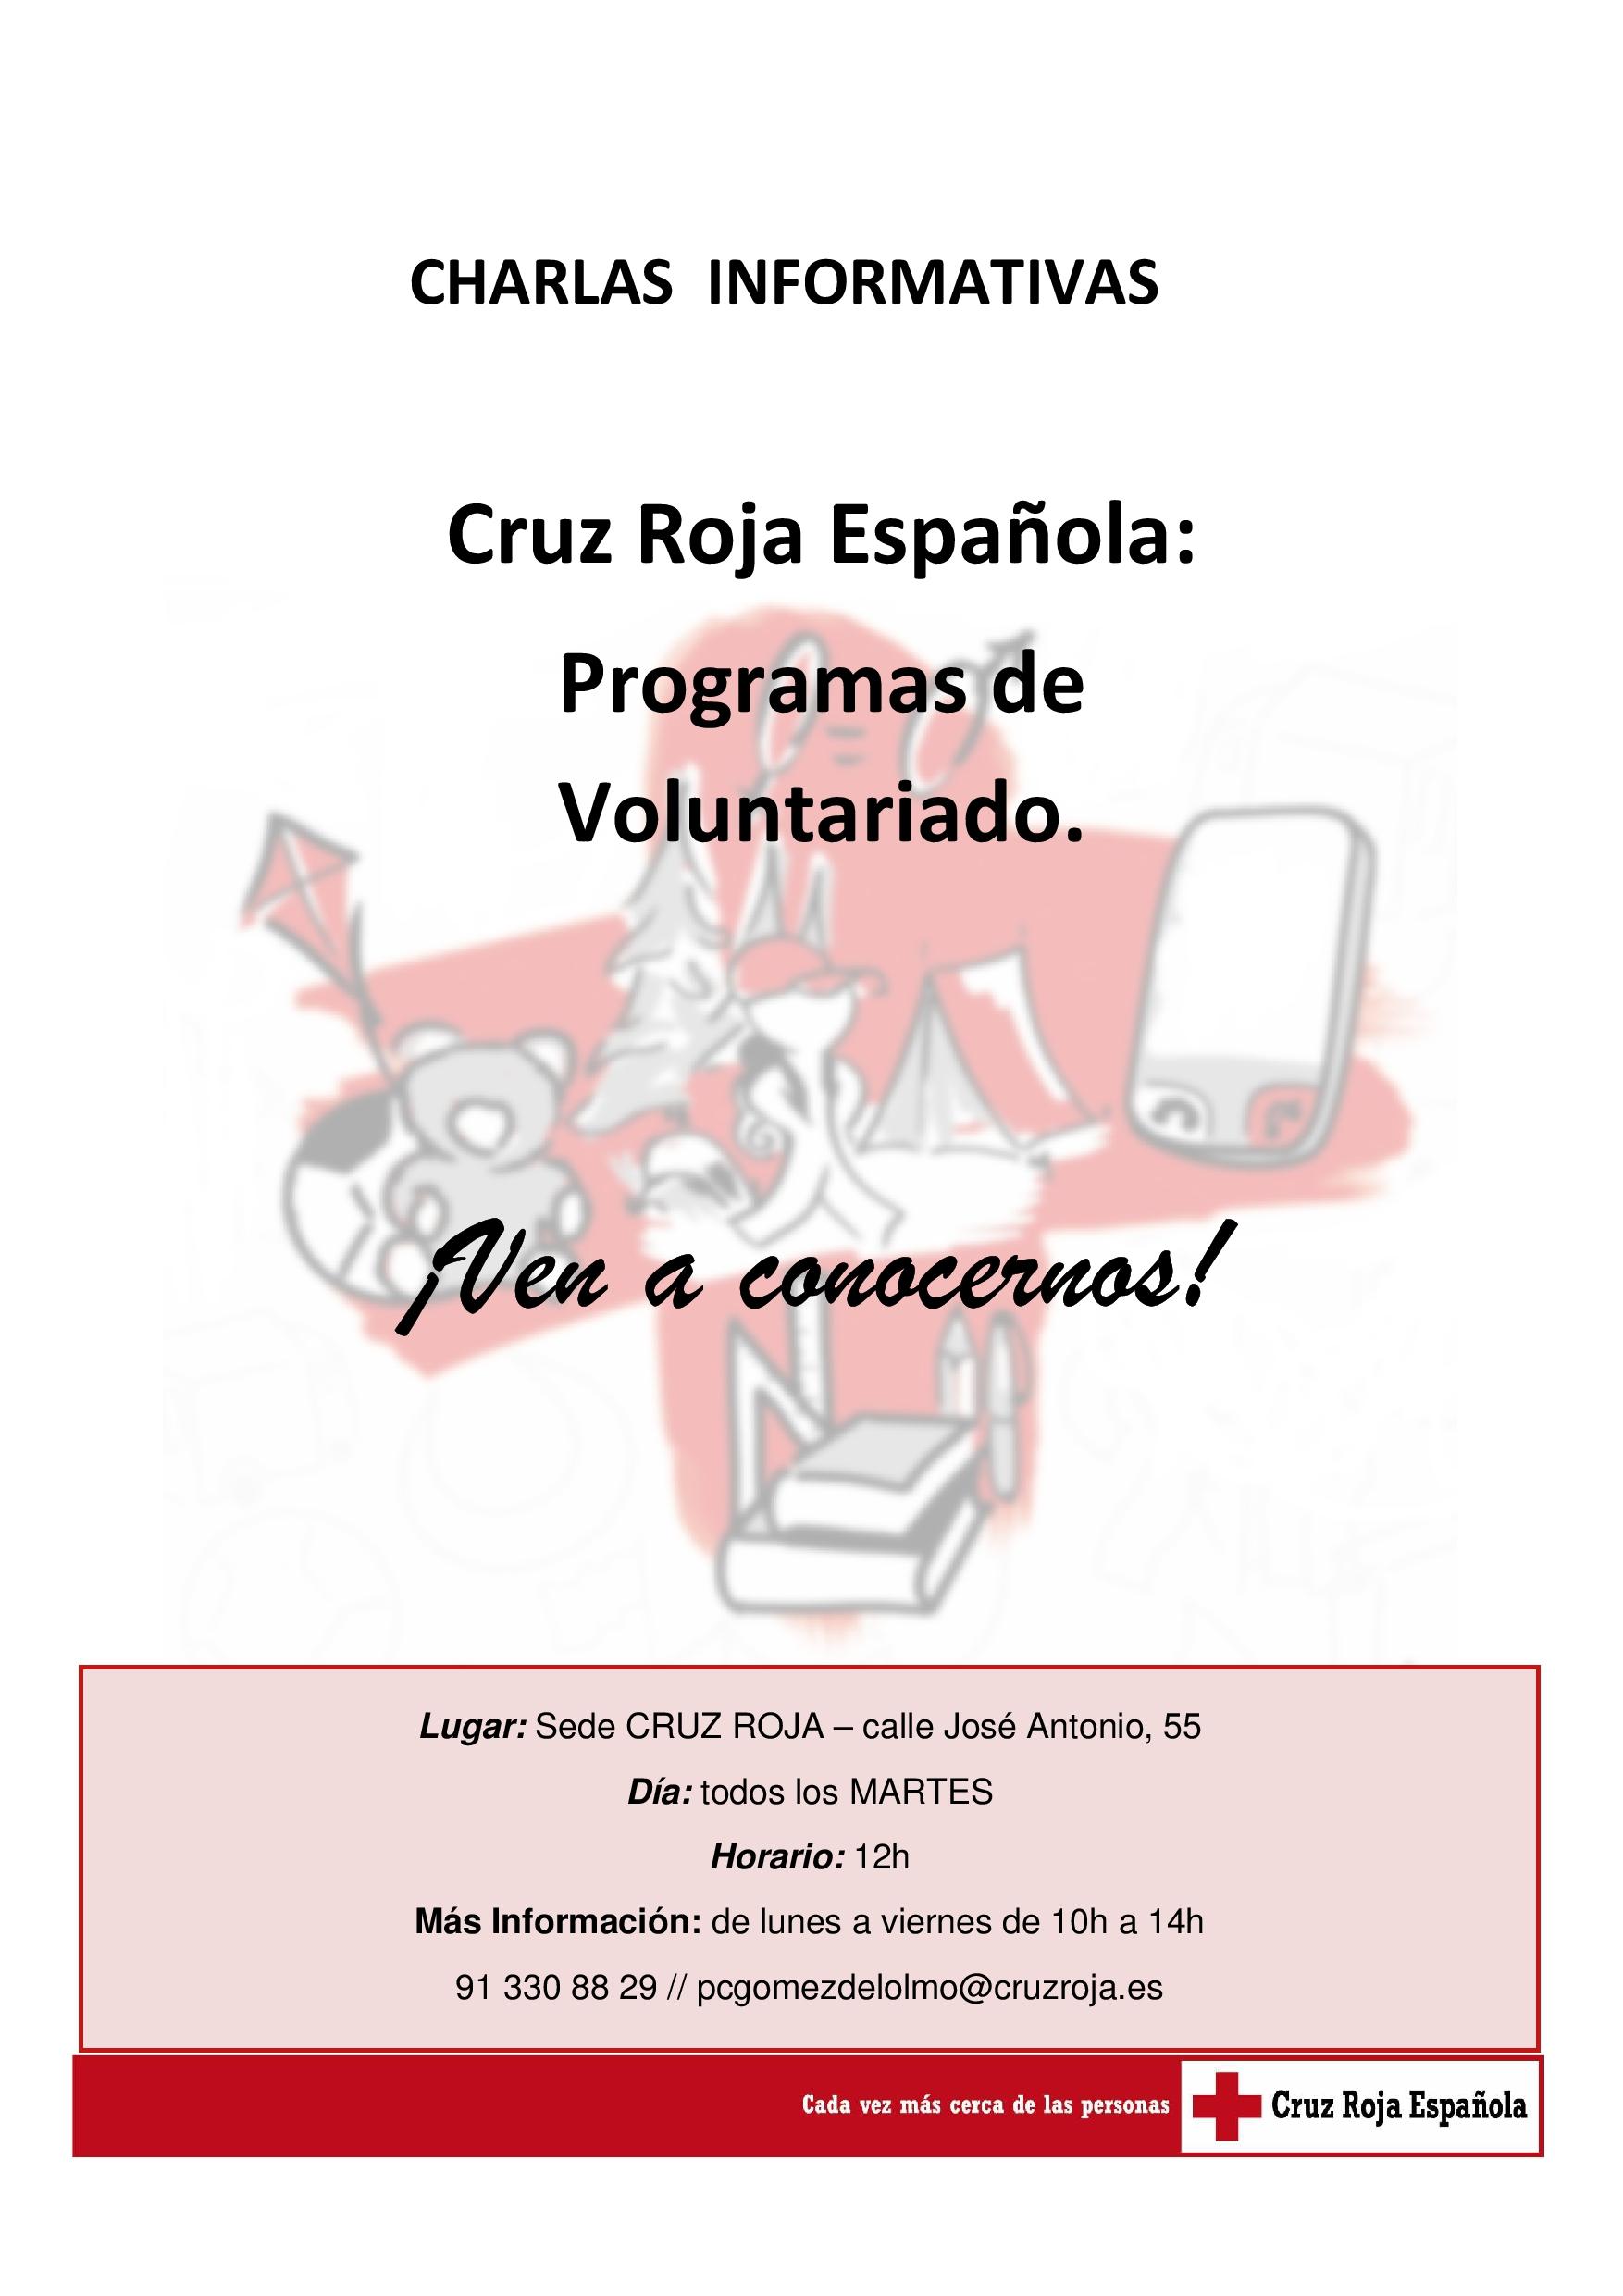 Charla informativa - Cruz Roja Española @ Sede Cruz Roja Sevilla la Nueva